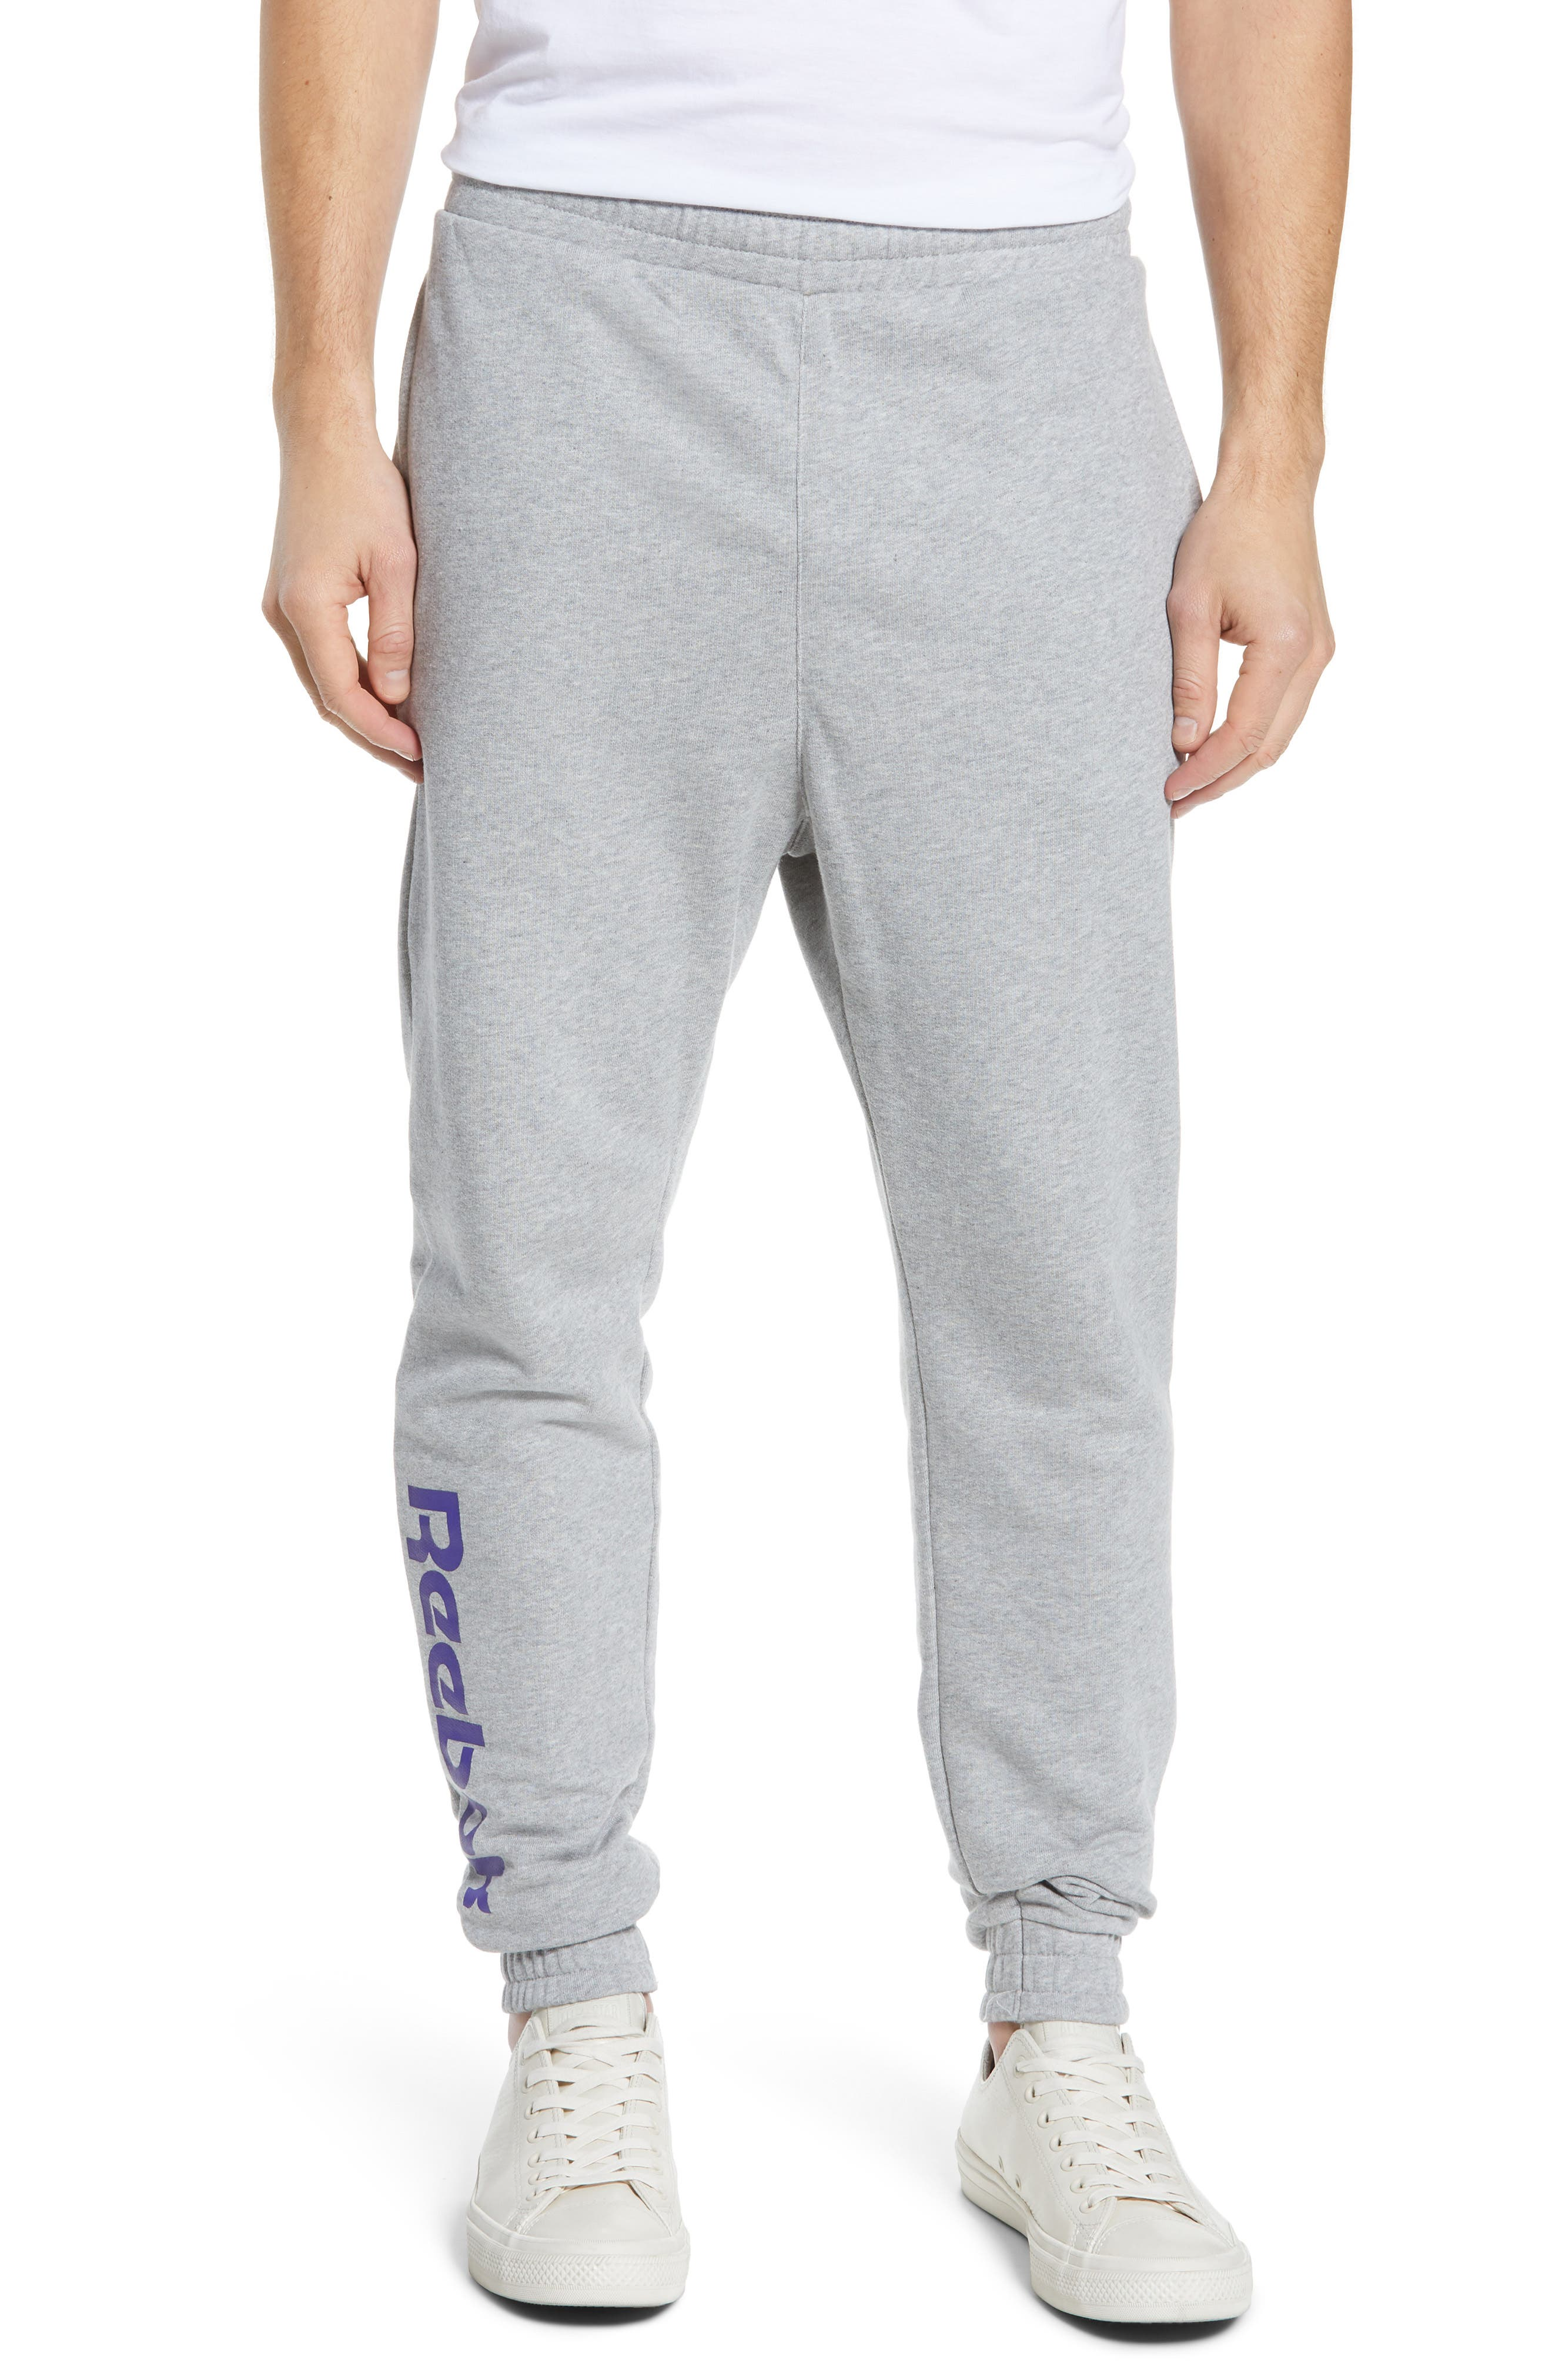 Reebok Vector Sweatpants